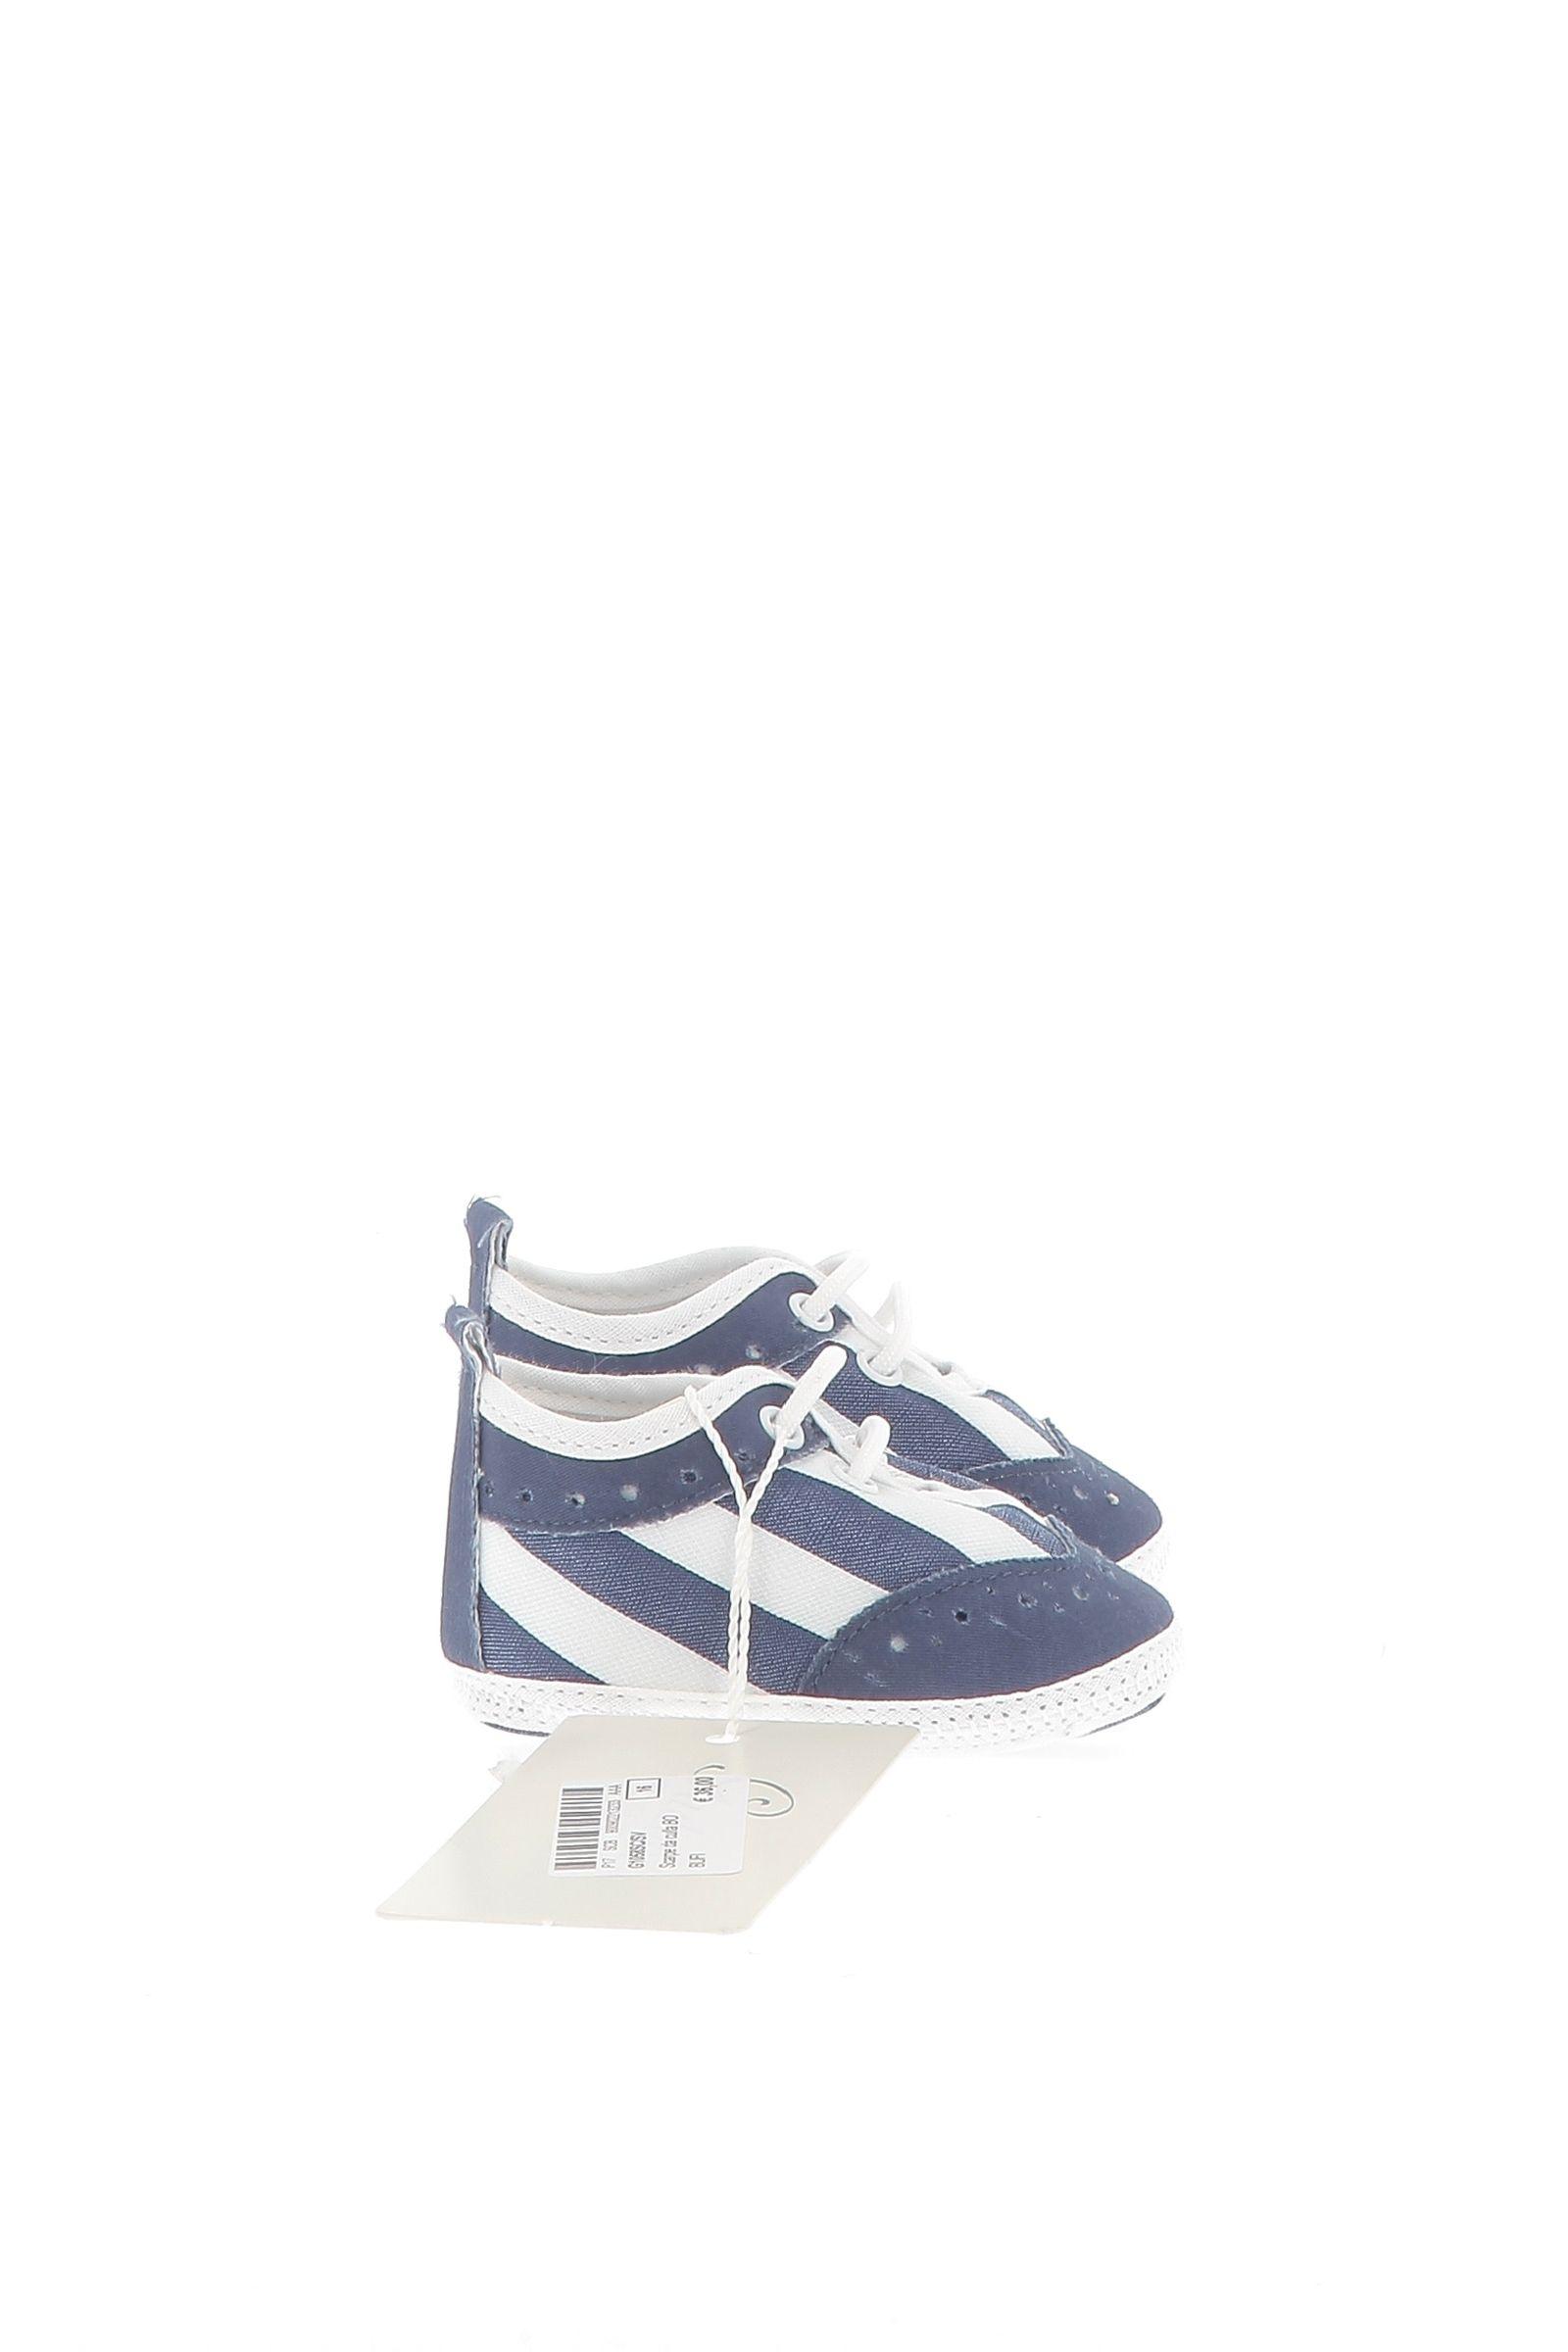 bufi scarpe BUFI | Scarpe da culla | G1058SCSV